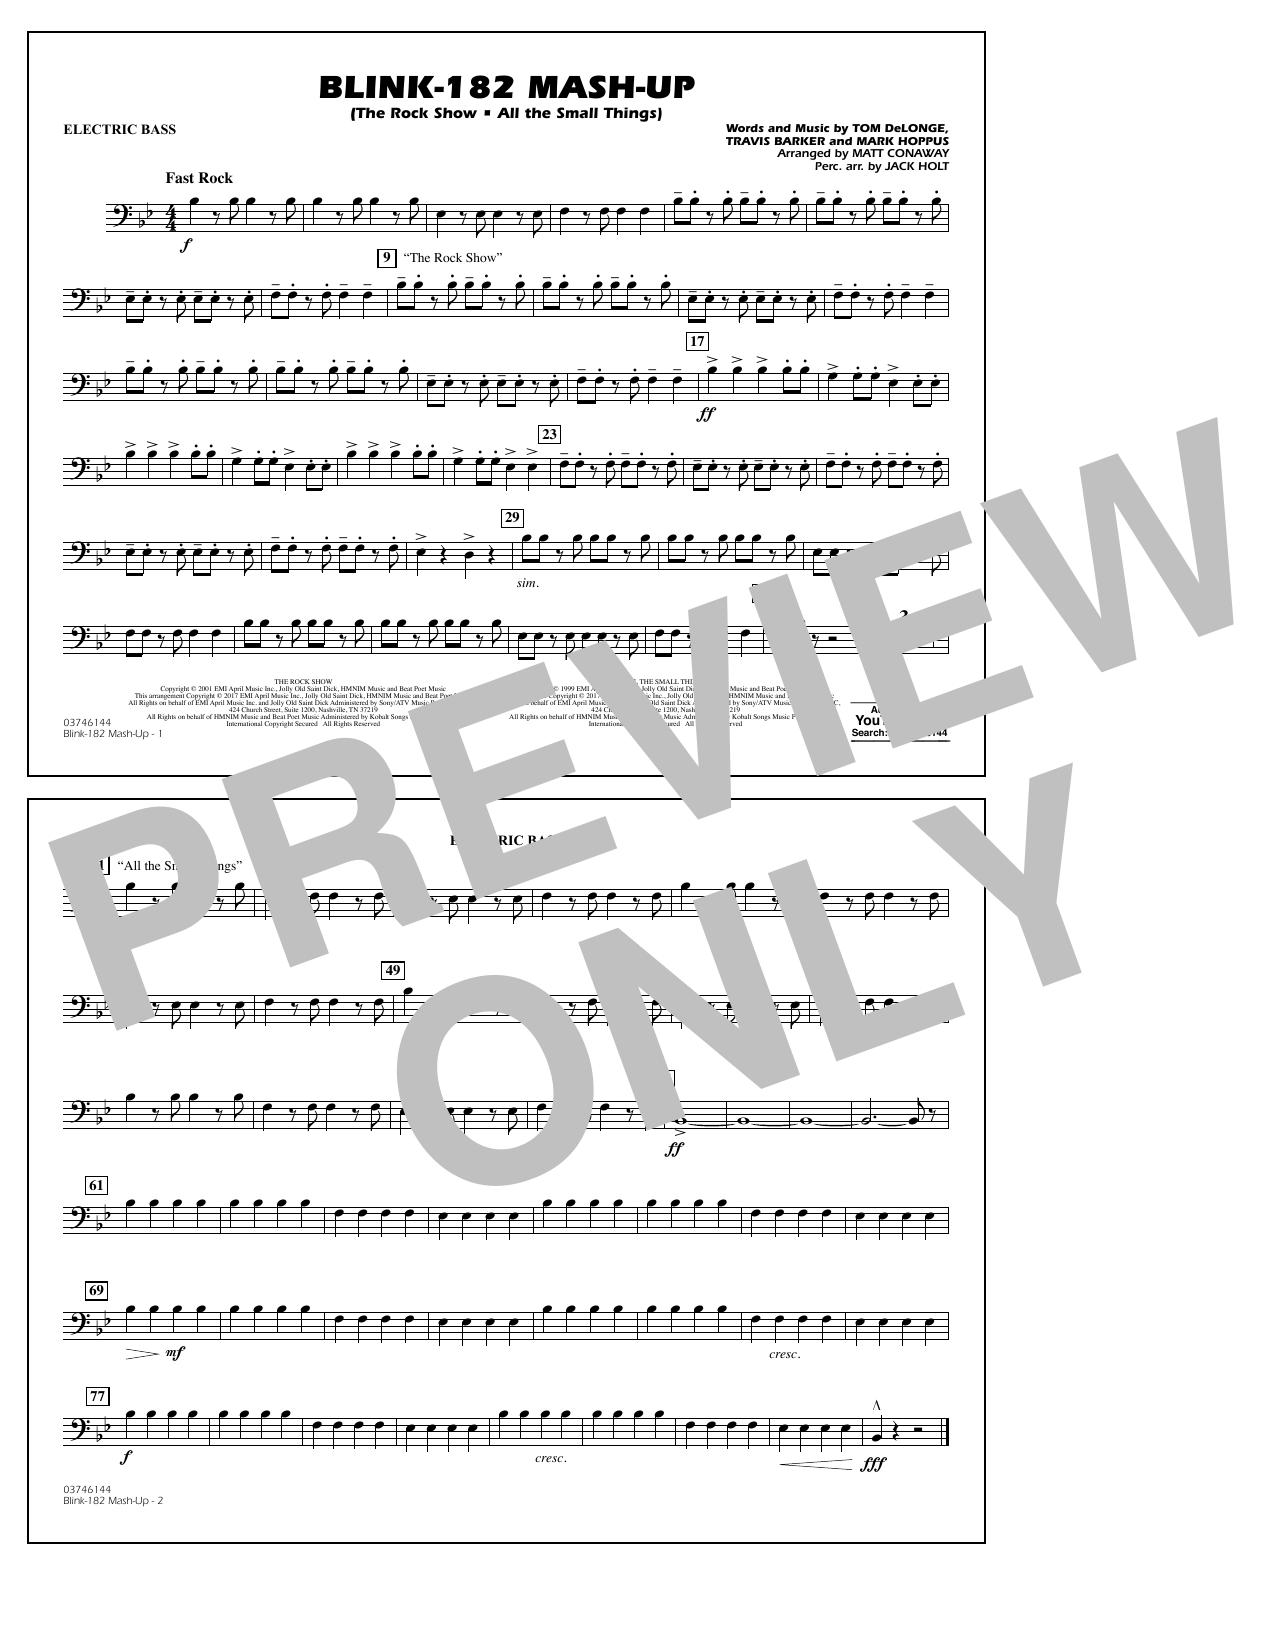 Blink-182 Mash-Up - Electric Bass Sheet Music